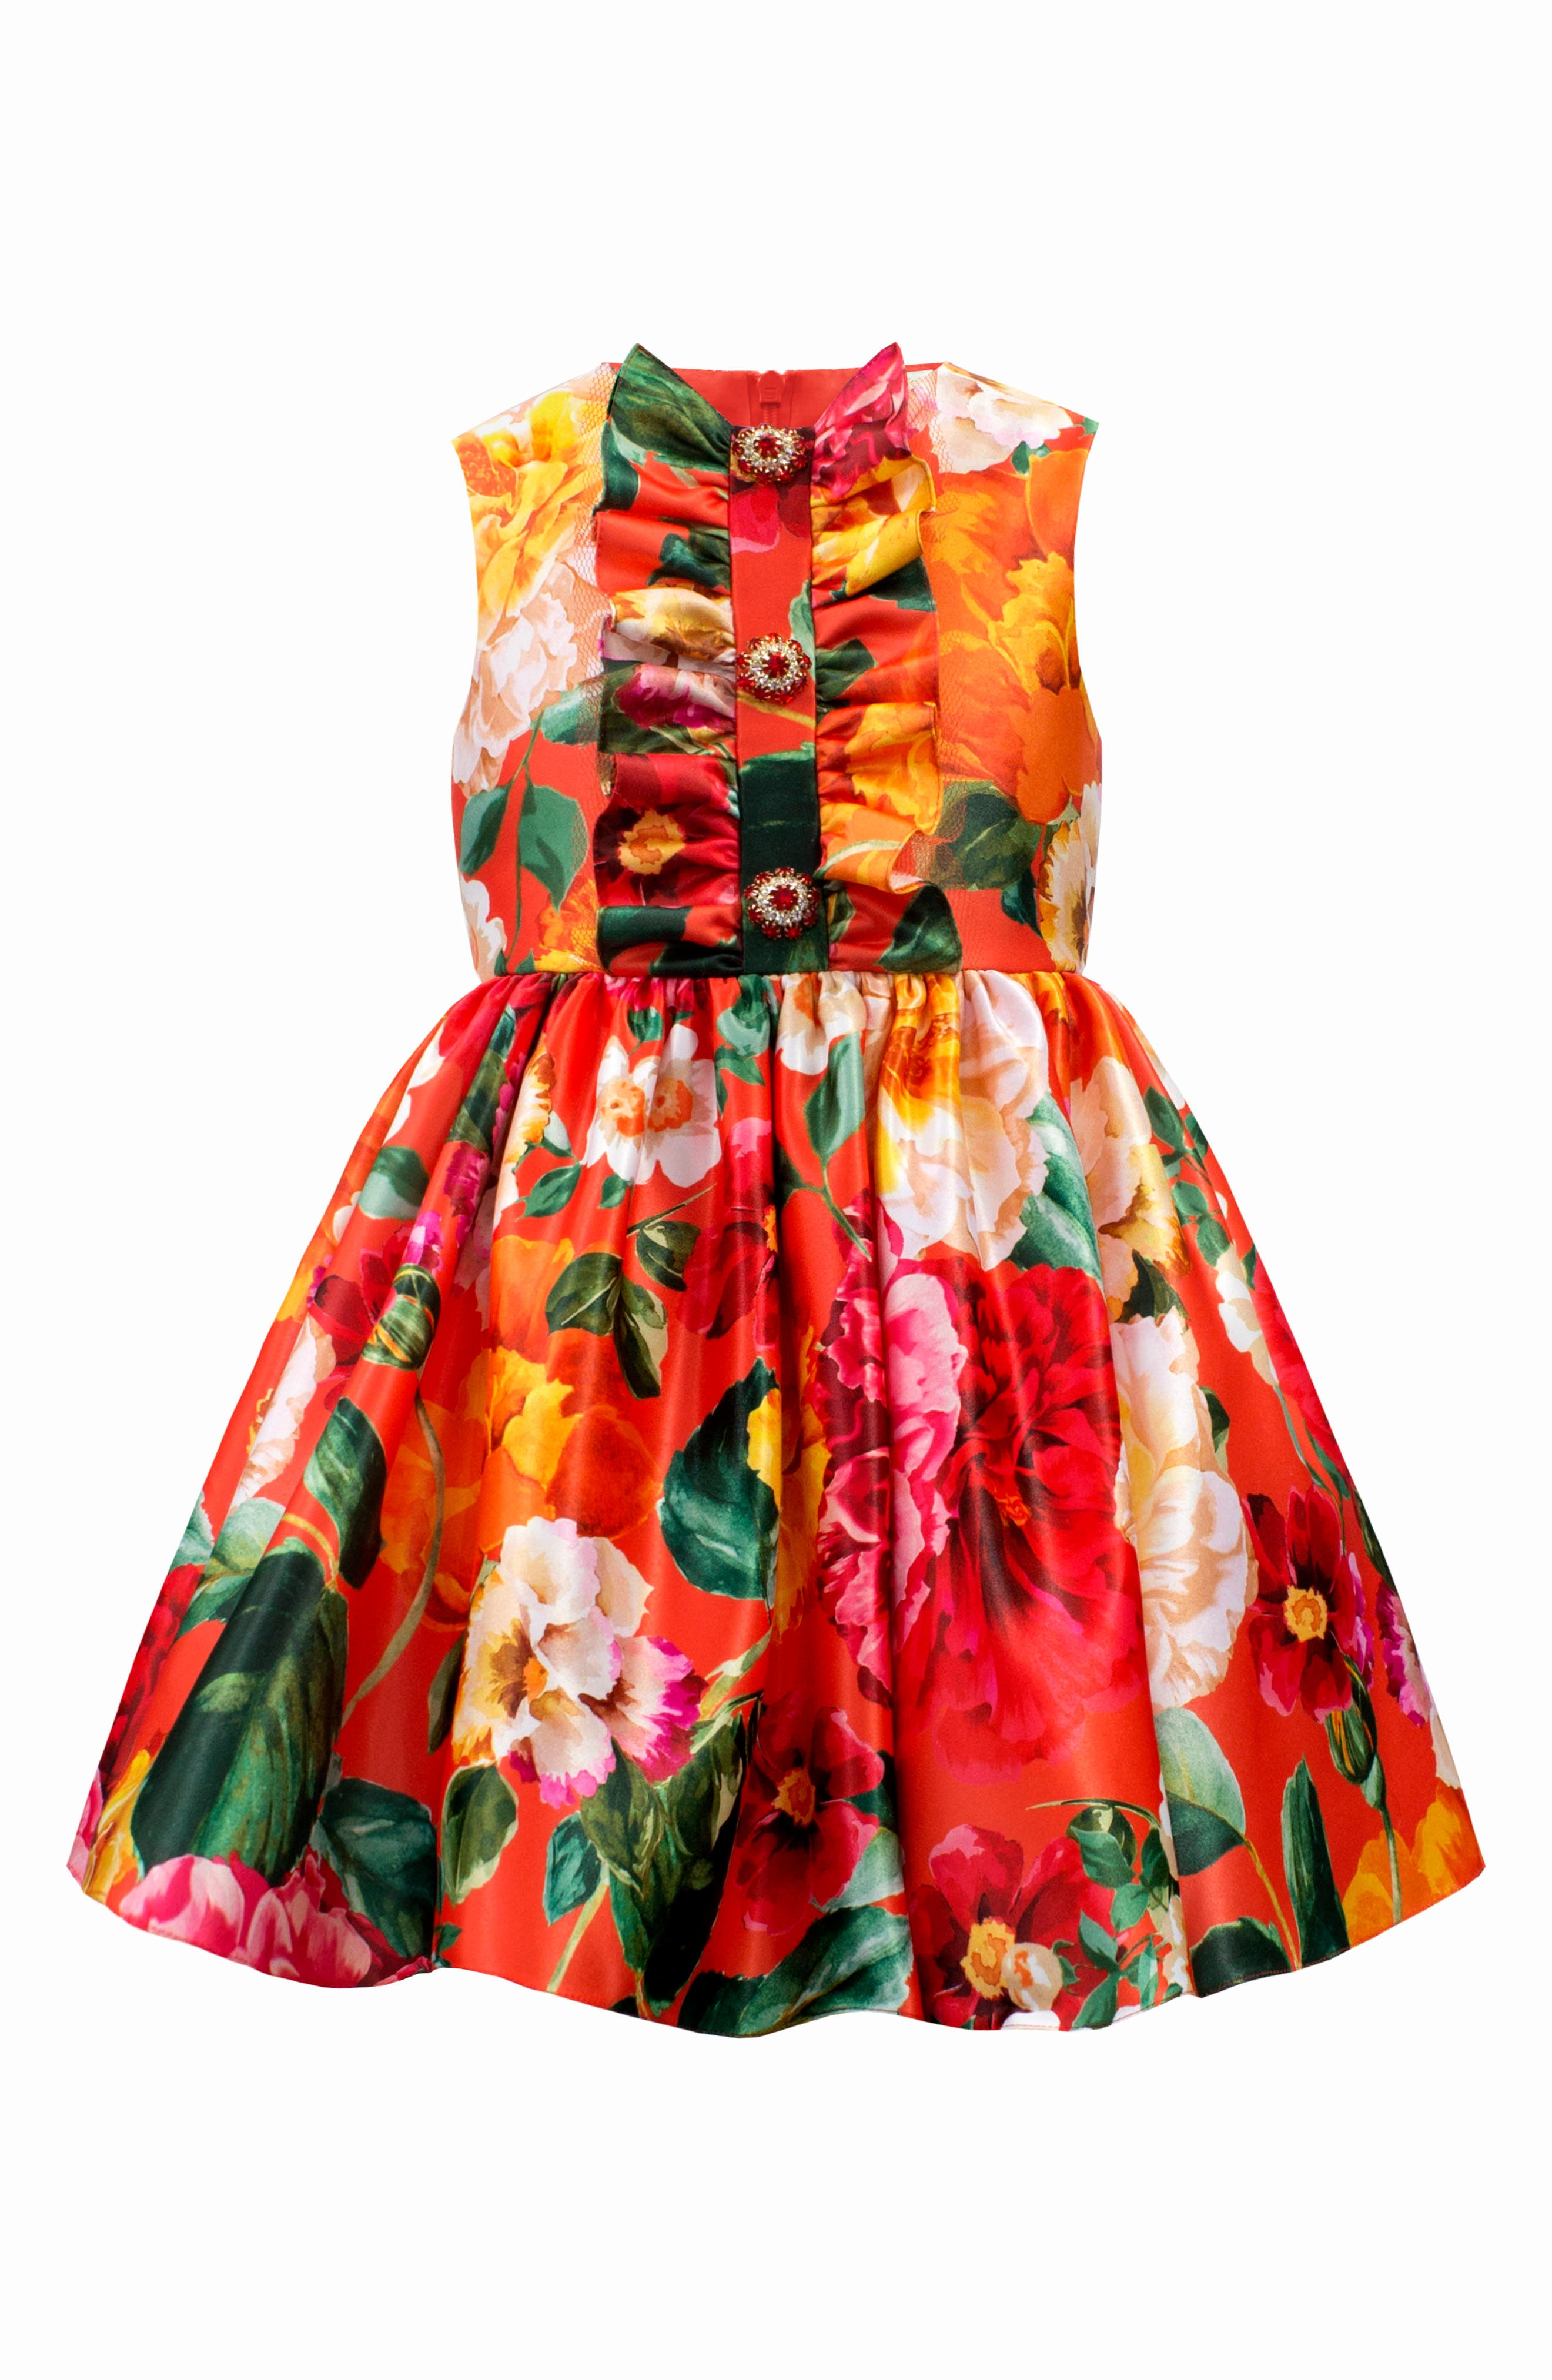 DAVID CHARLES Floral Print Frilled Satin Party Dress, Main, color, ORANGE